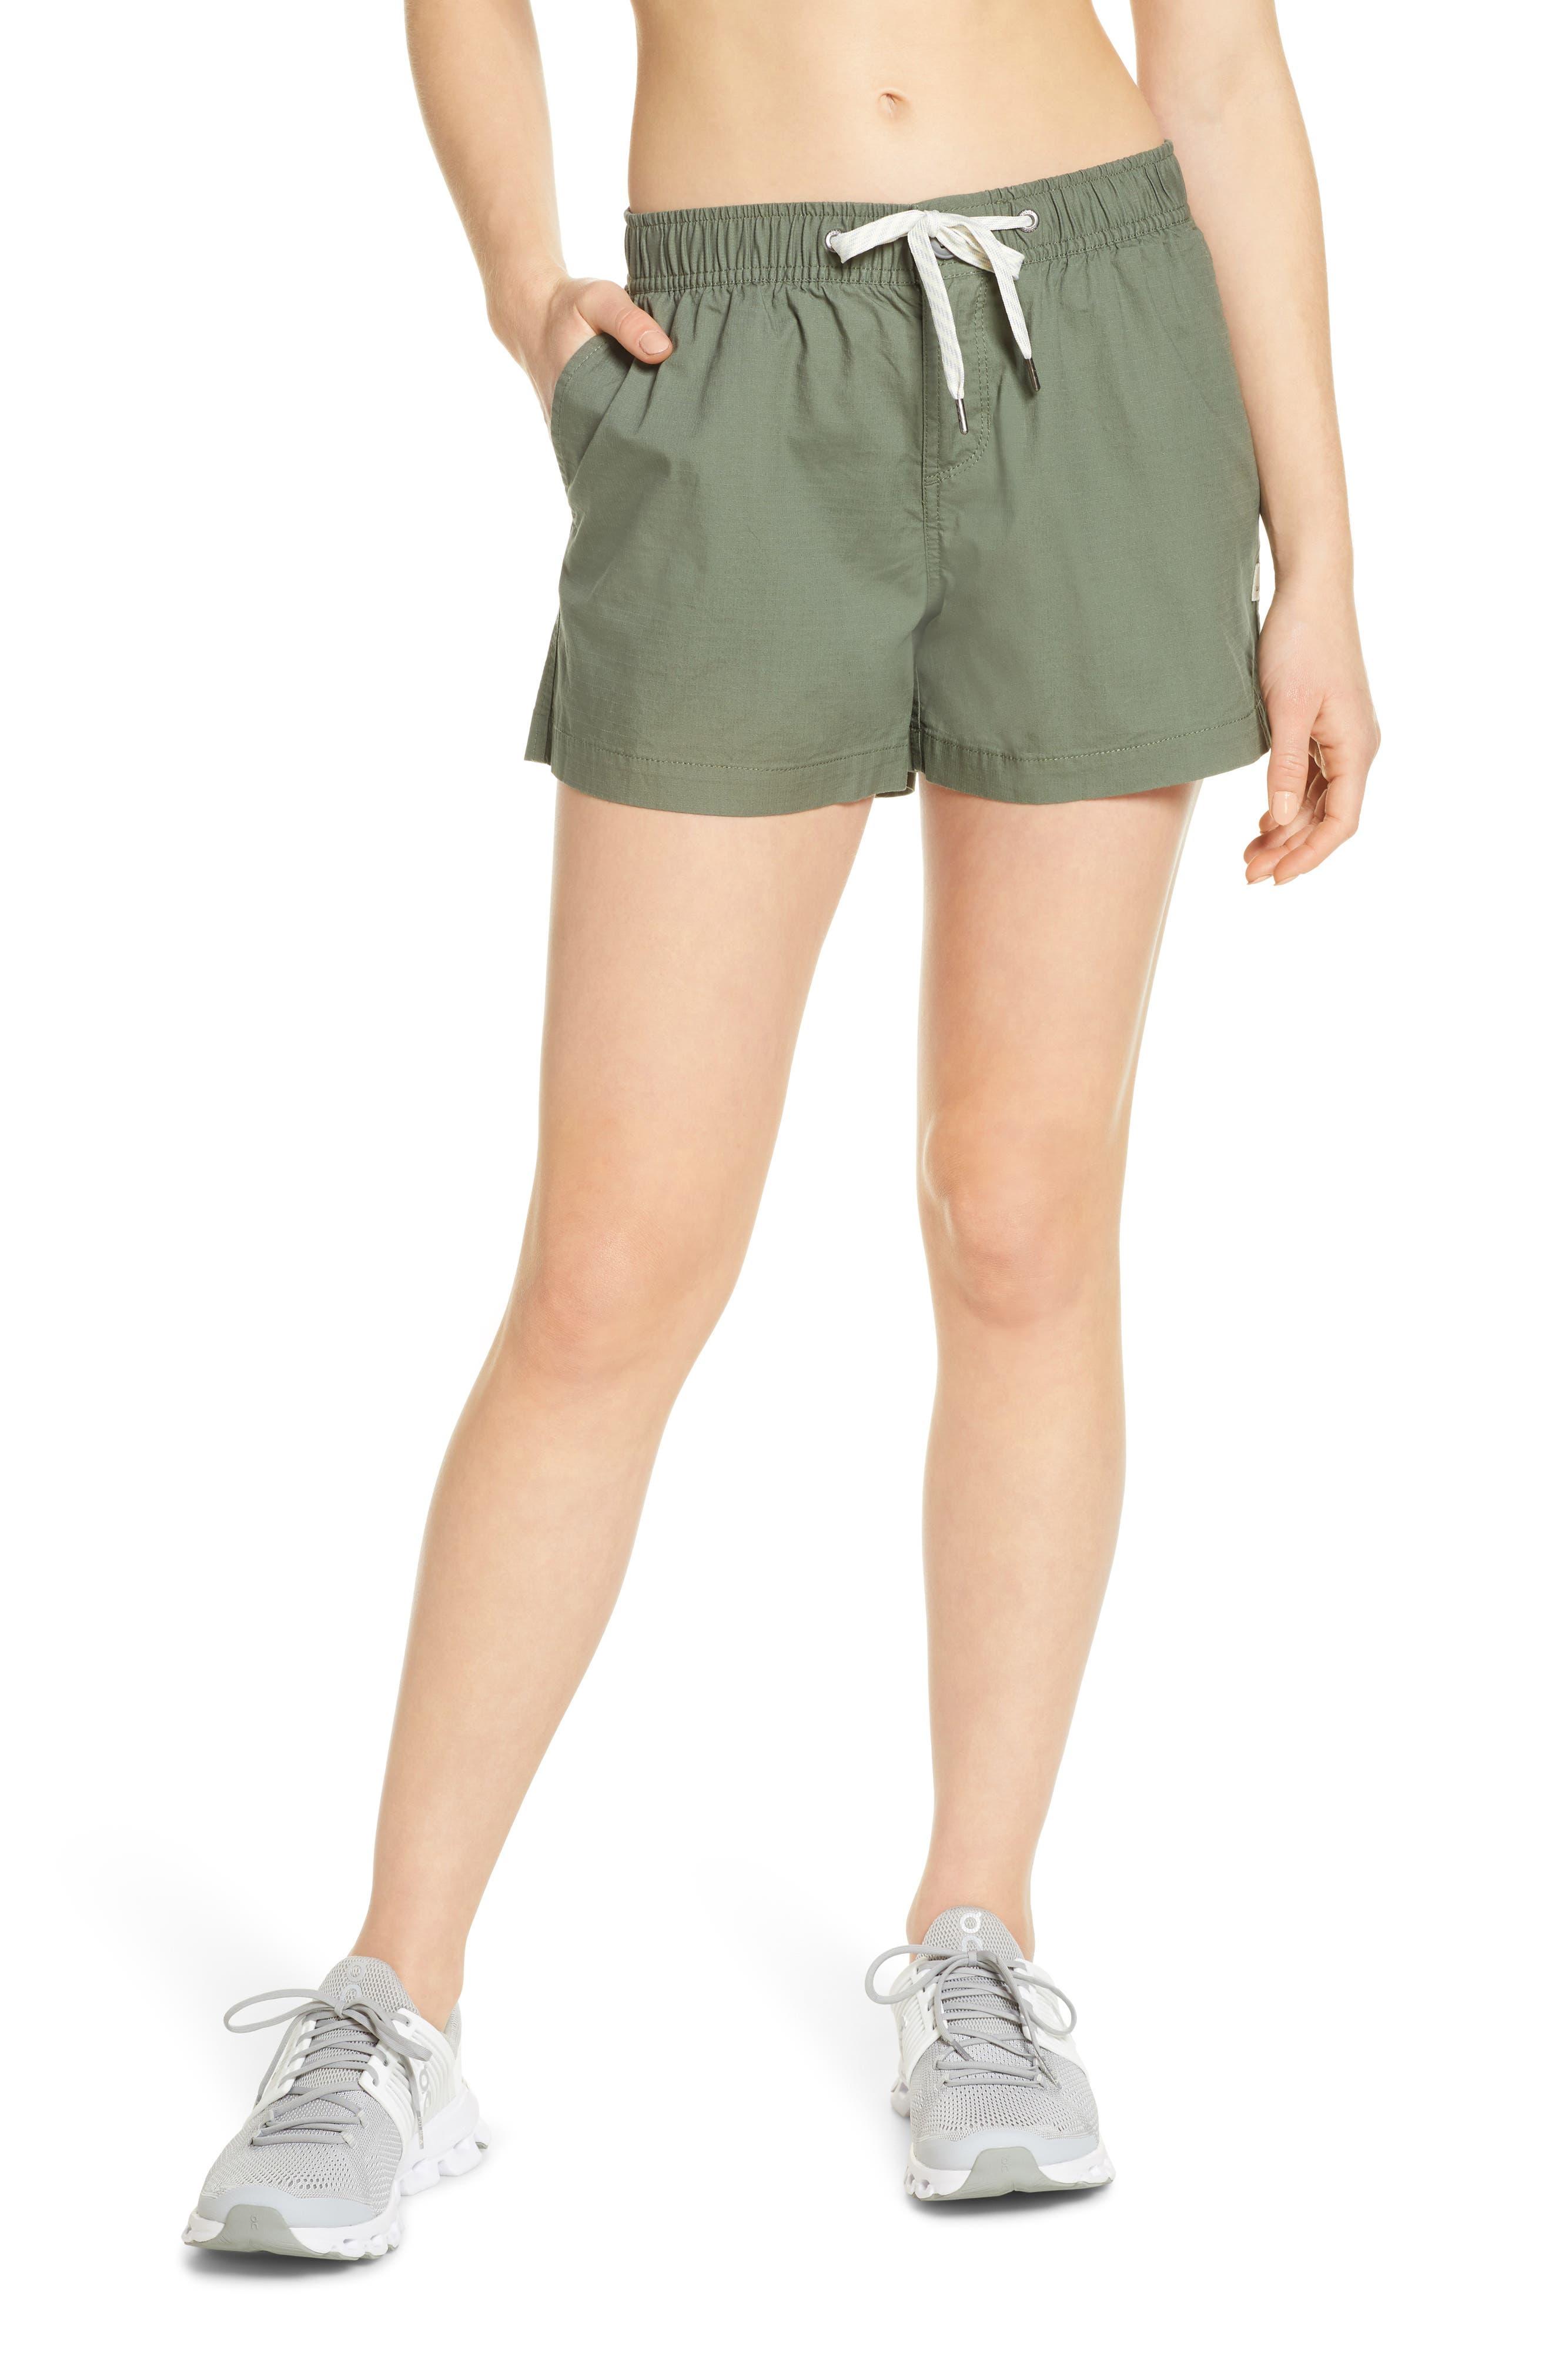 Women's Vuori Ripstop Shorts,  Small - Green